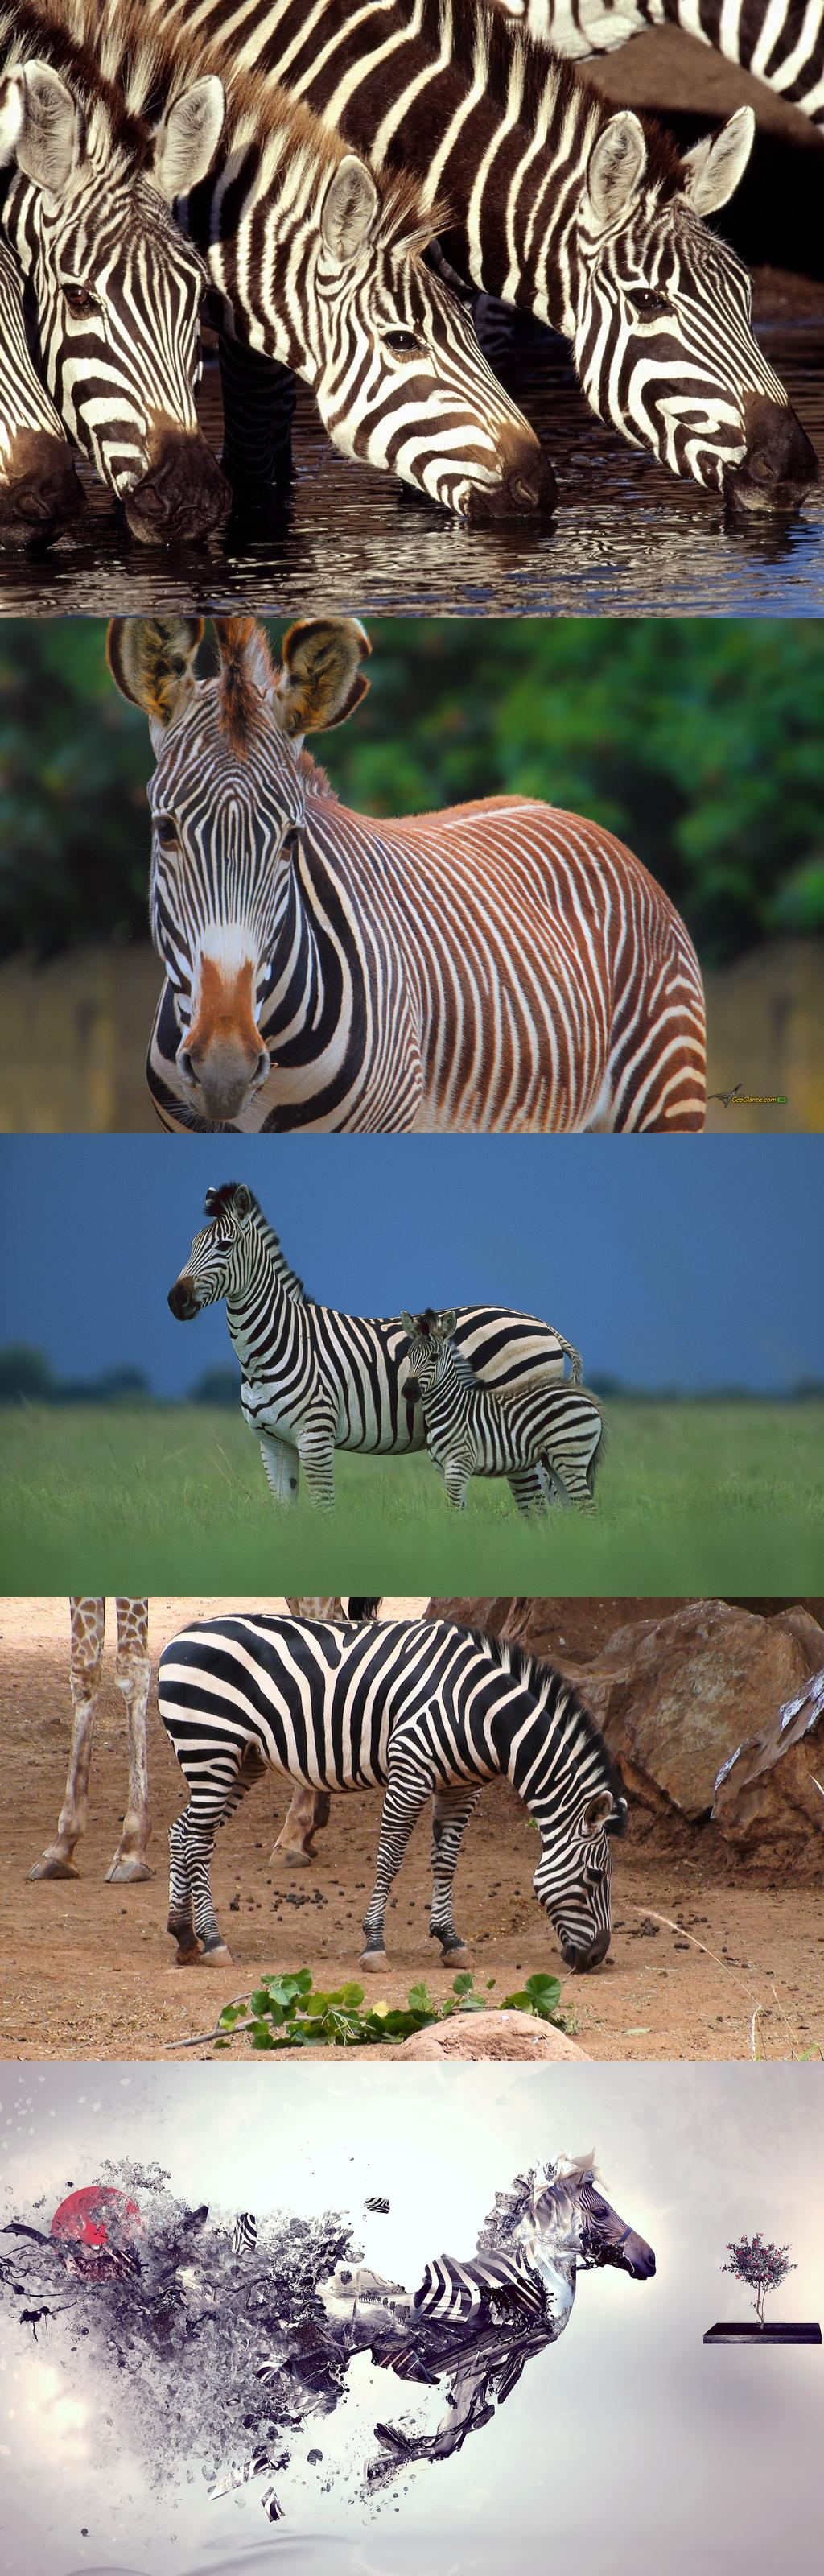 zebra, computer